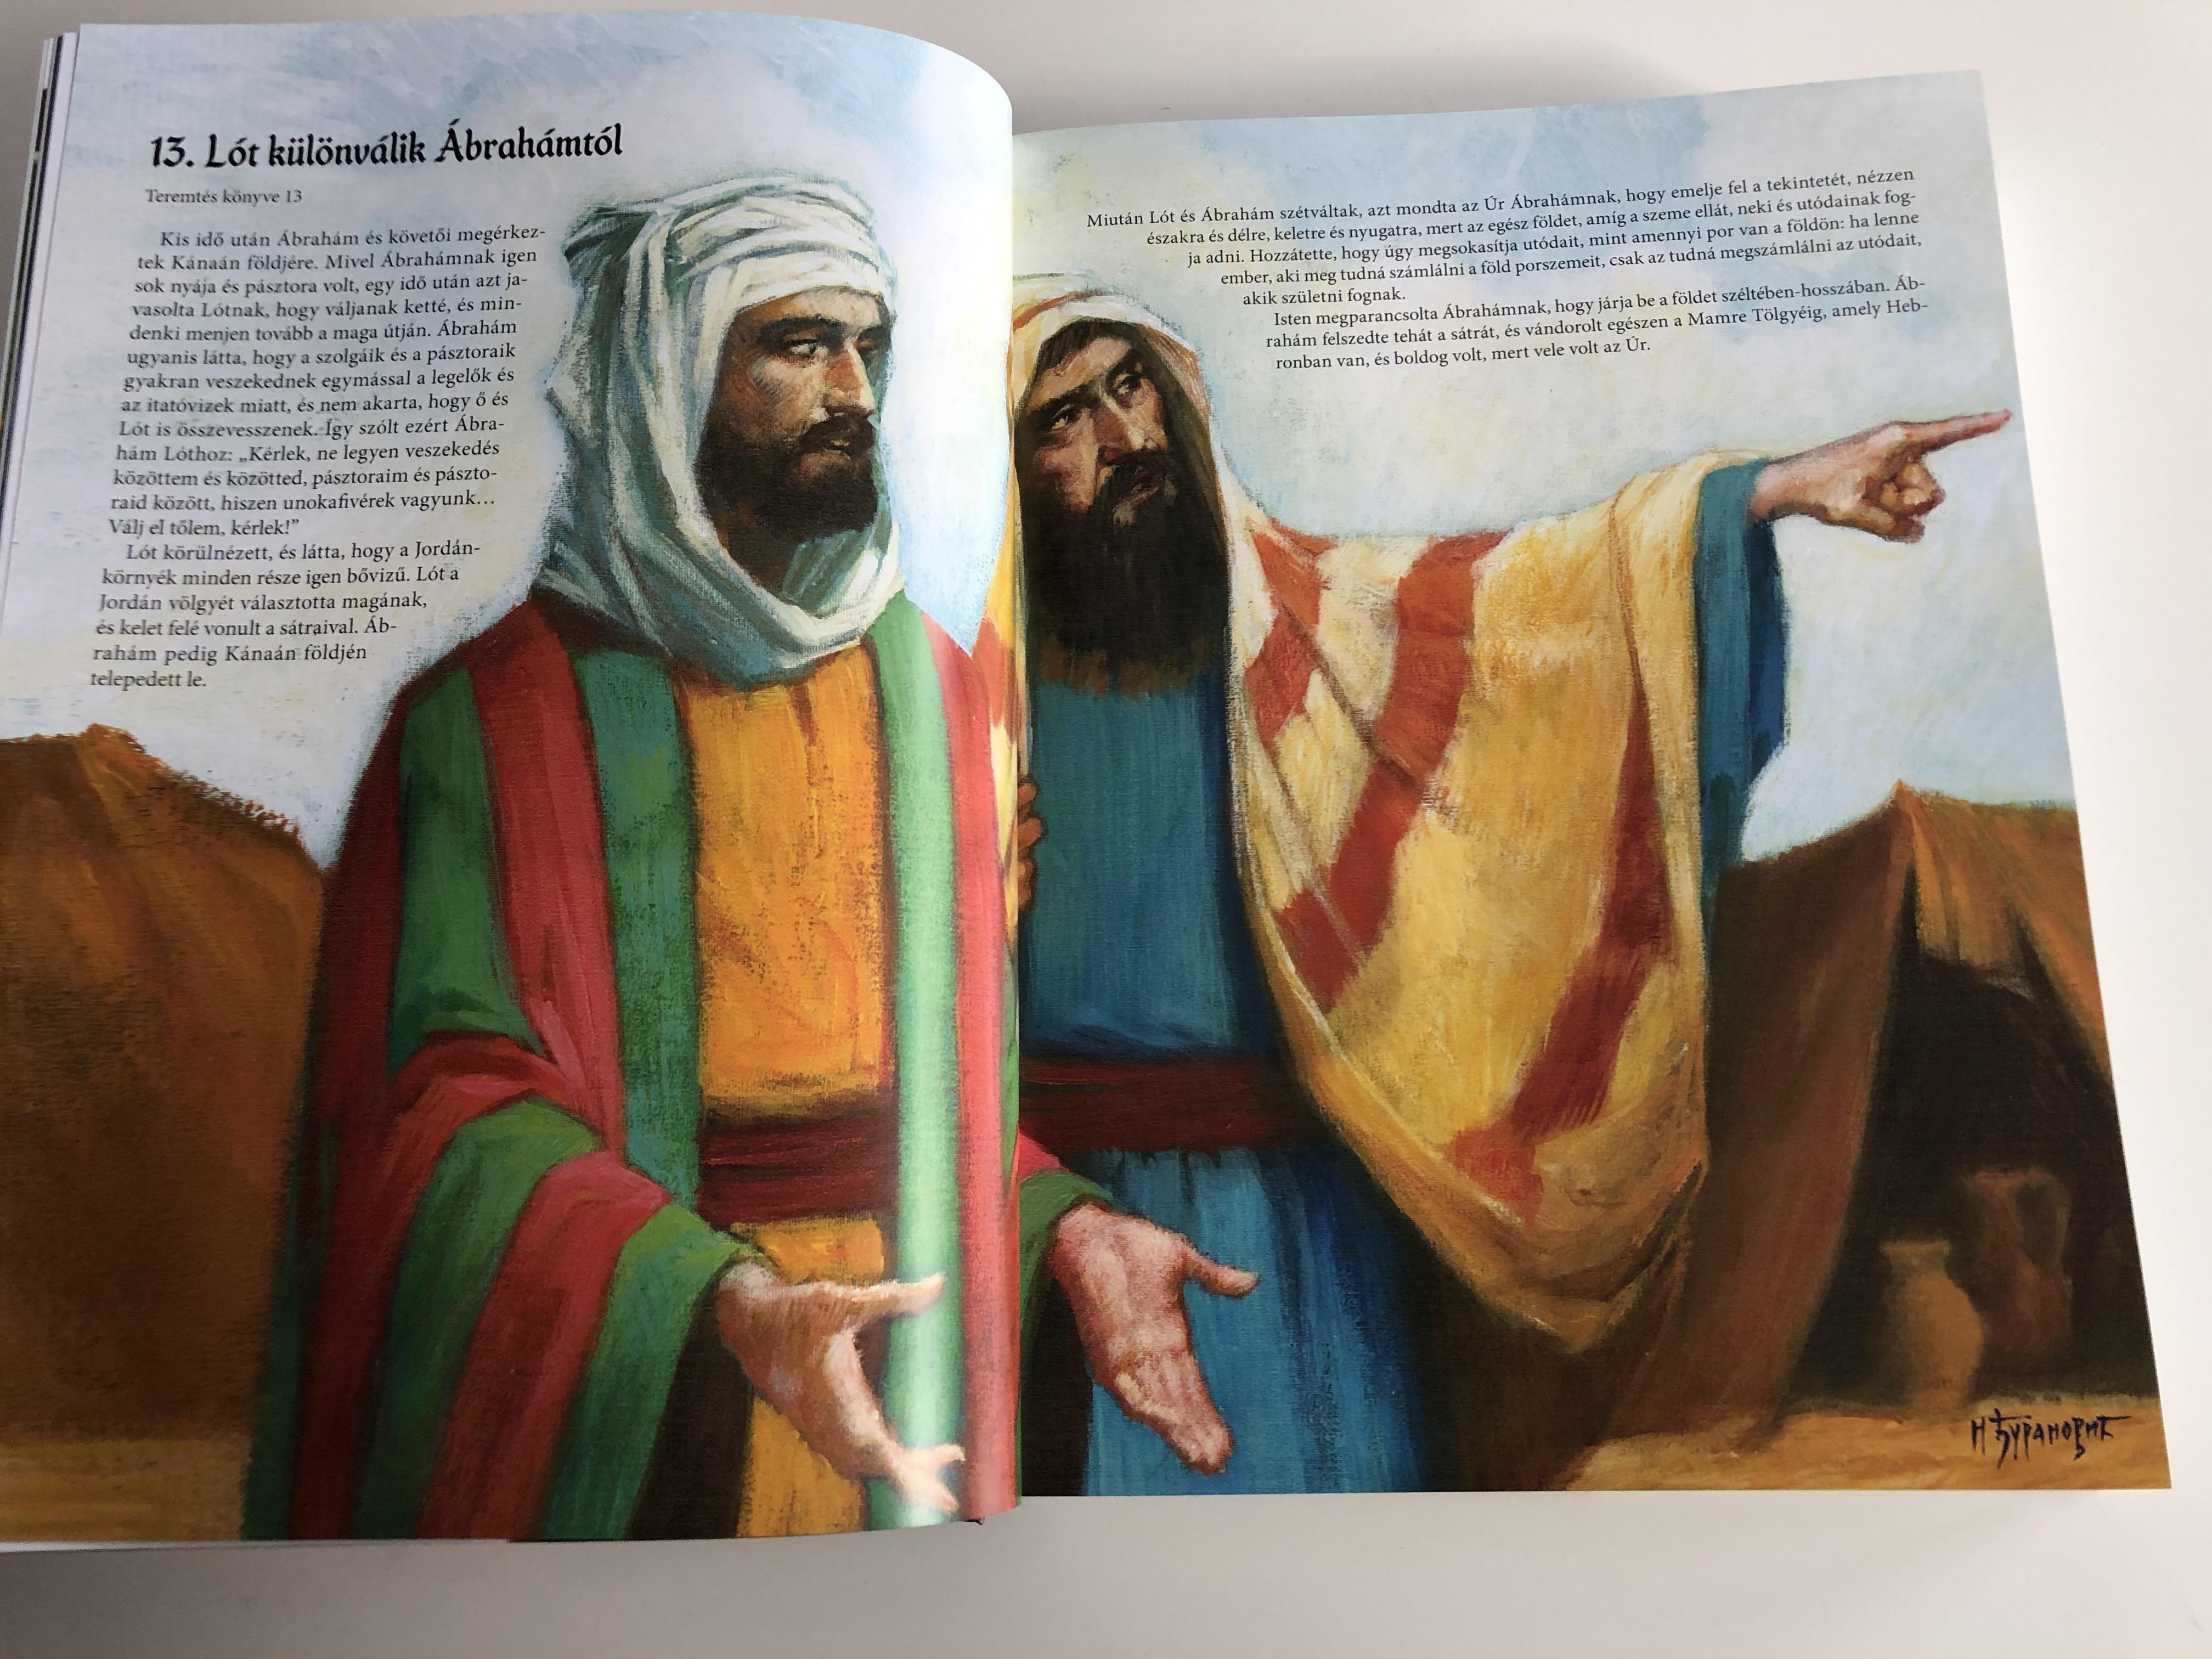 k-pes-biblia-r-k-t-rt-netek-az-s-365-napj-ra-hungarian-language-children-s-bible-stories-for-365-days-5.jpg